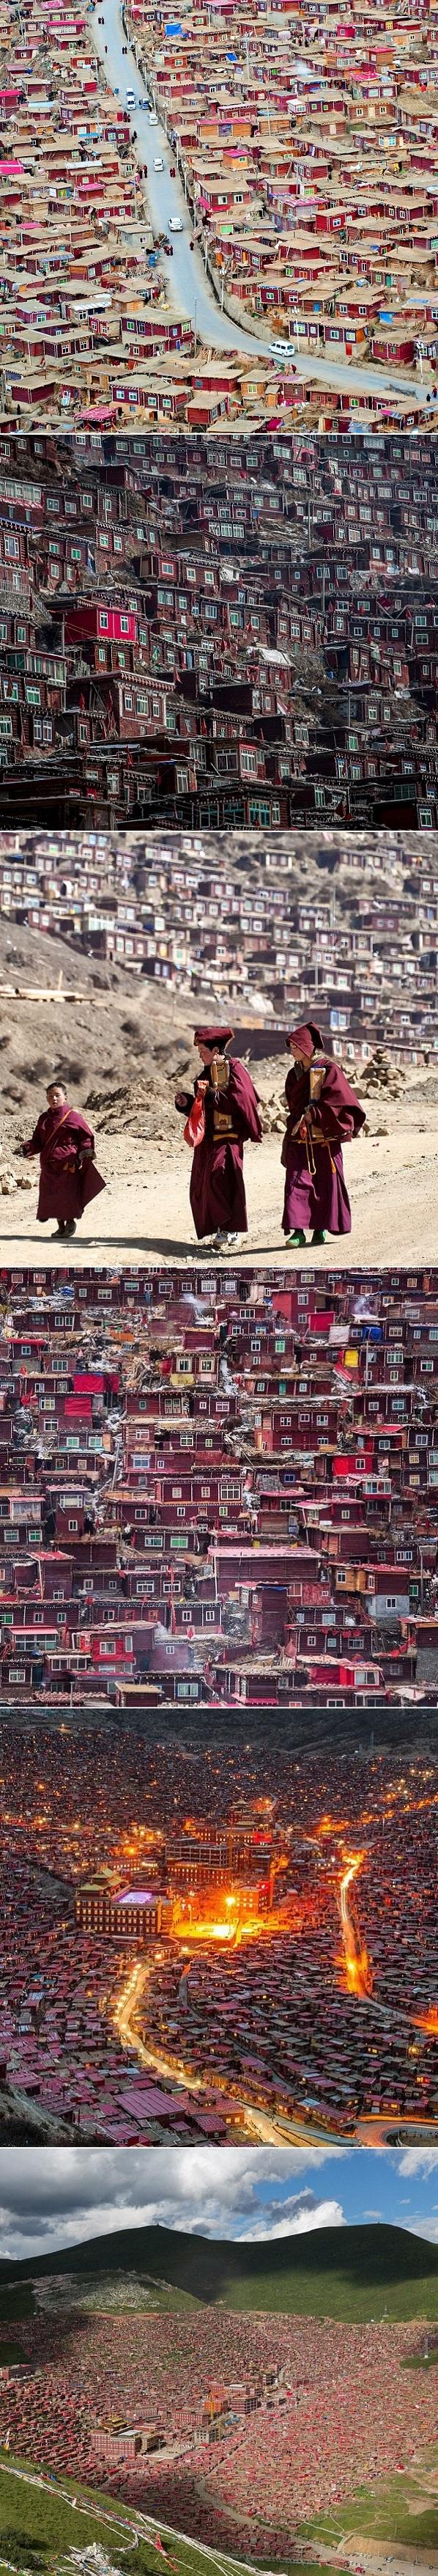 Travel Lust: Buddhist Academy in China